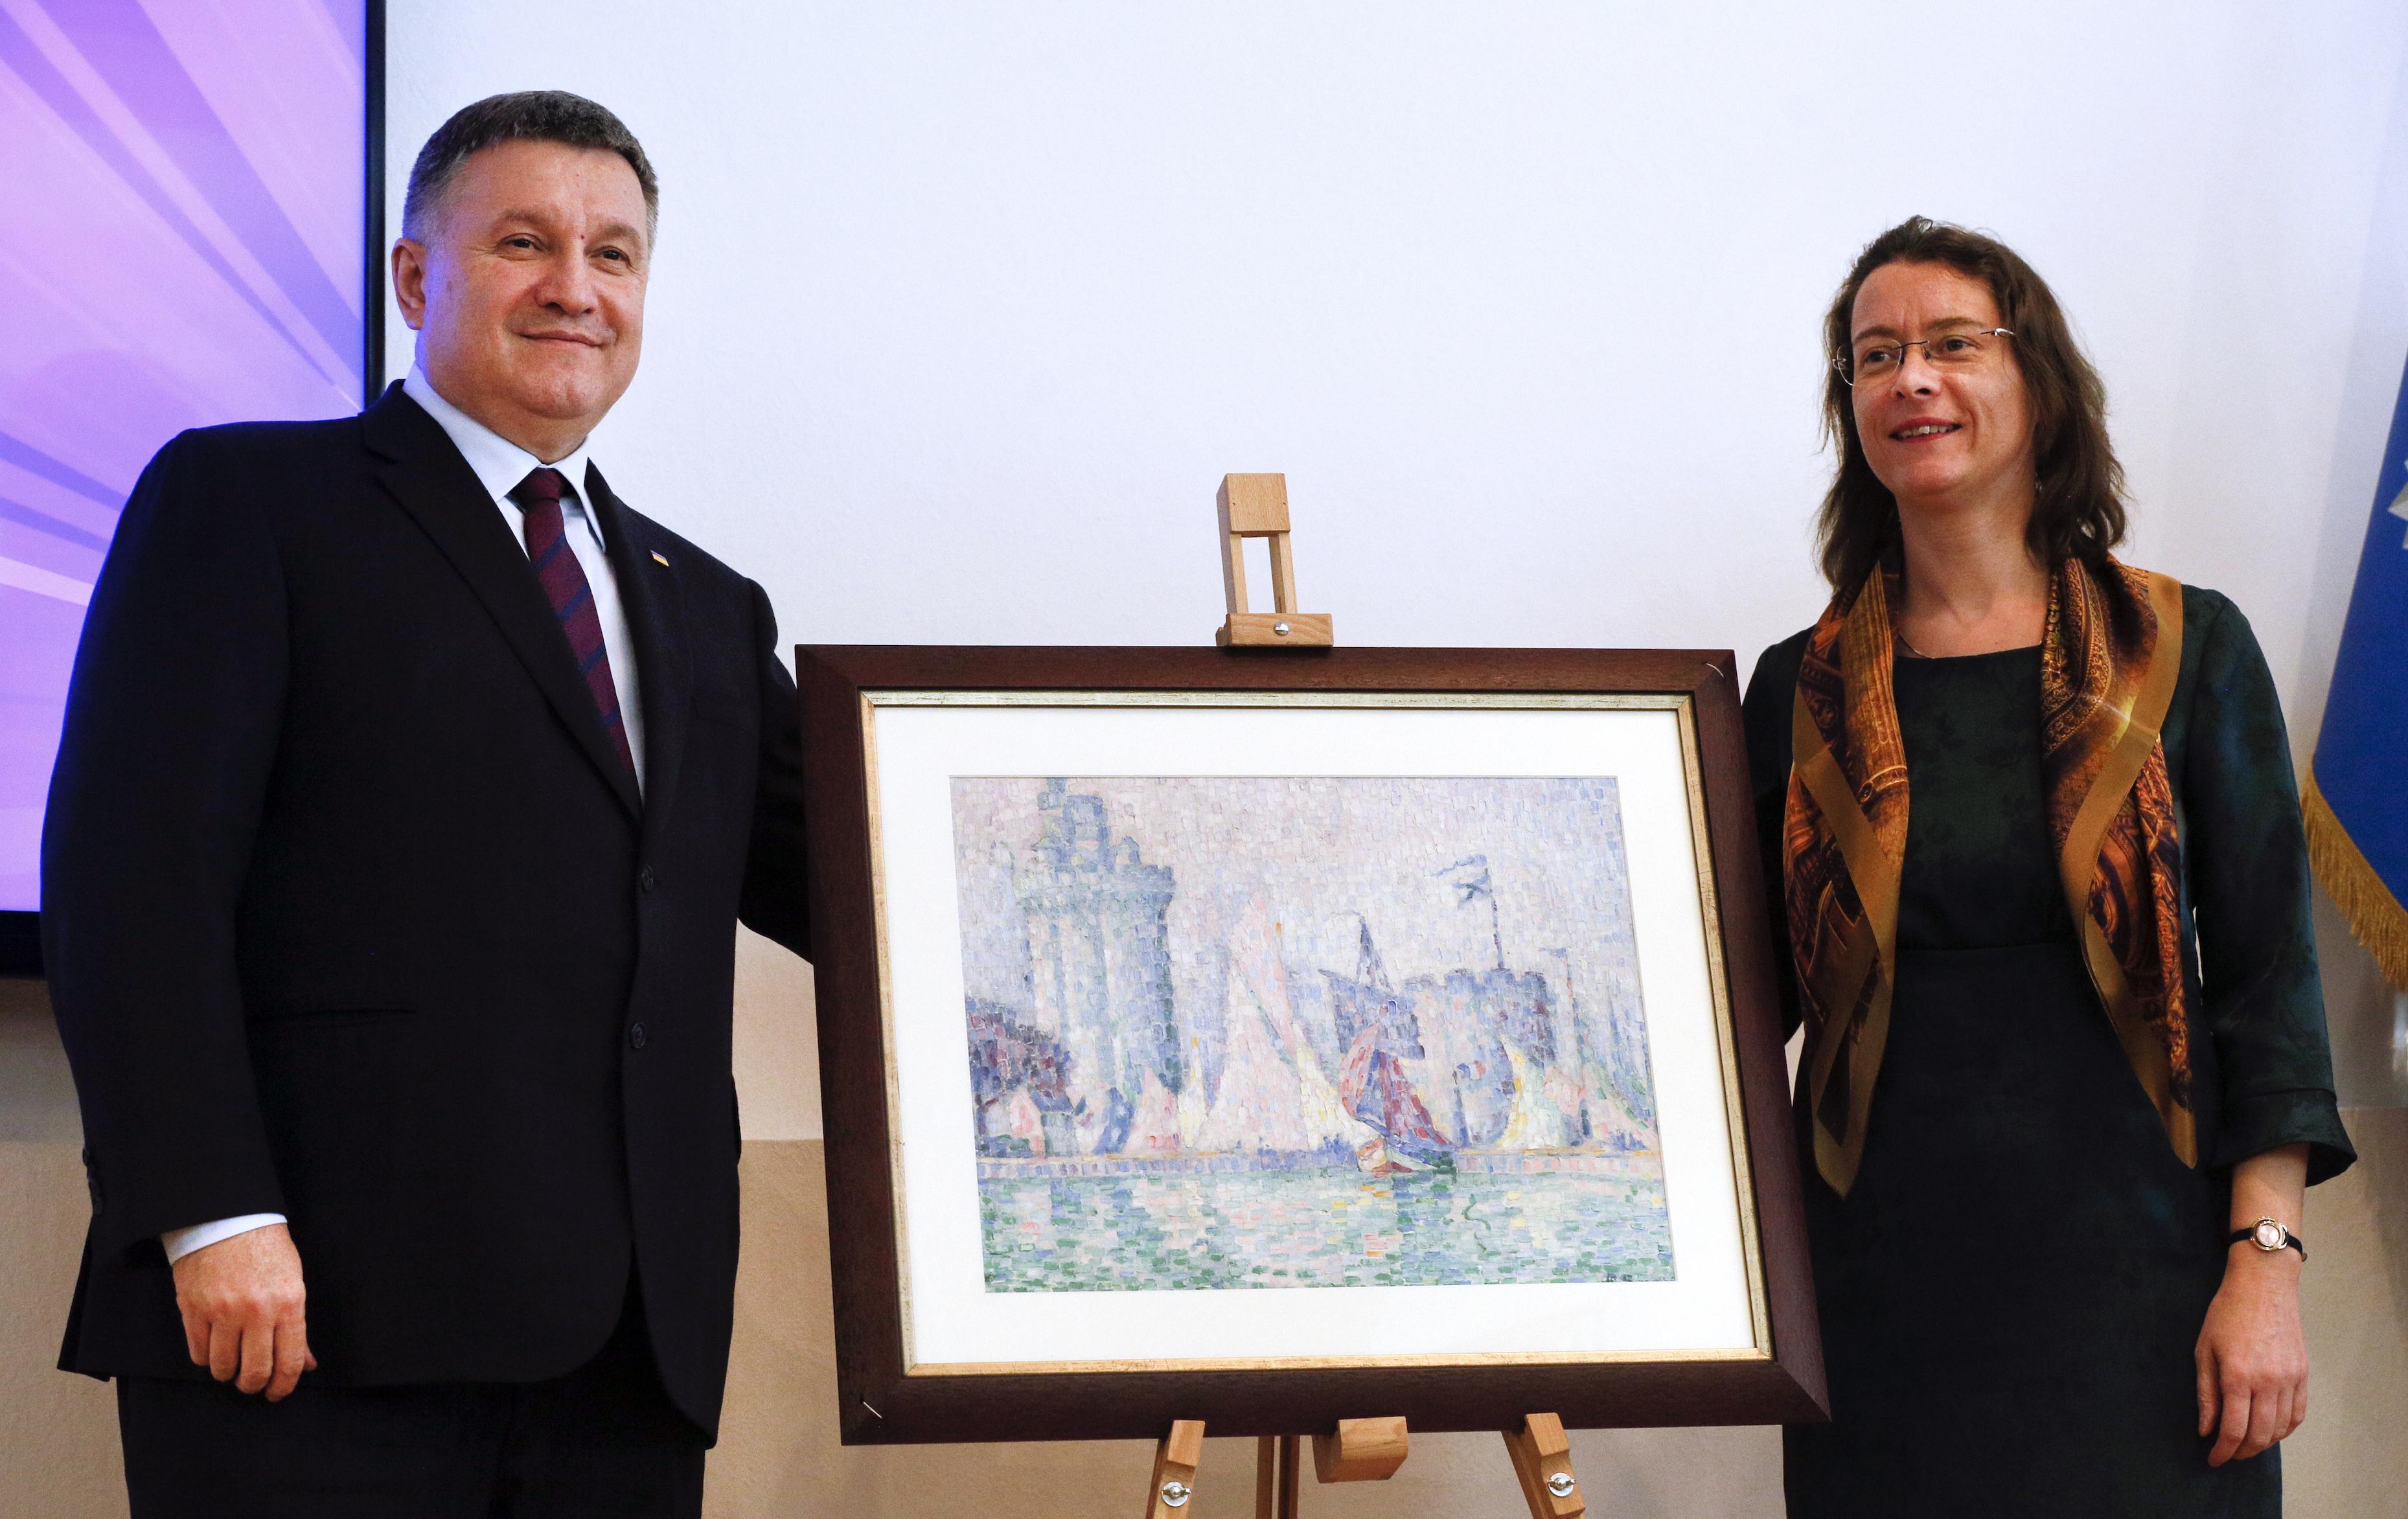 Ukrainian Interior Minister Arsen Avakov, left, and French Ambassador to Ukraine Isabelle Dumont pose for a photo with the 1915 painting. Image: Efrem Lukatsky via The Public's Radio